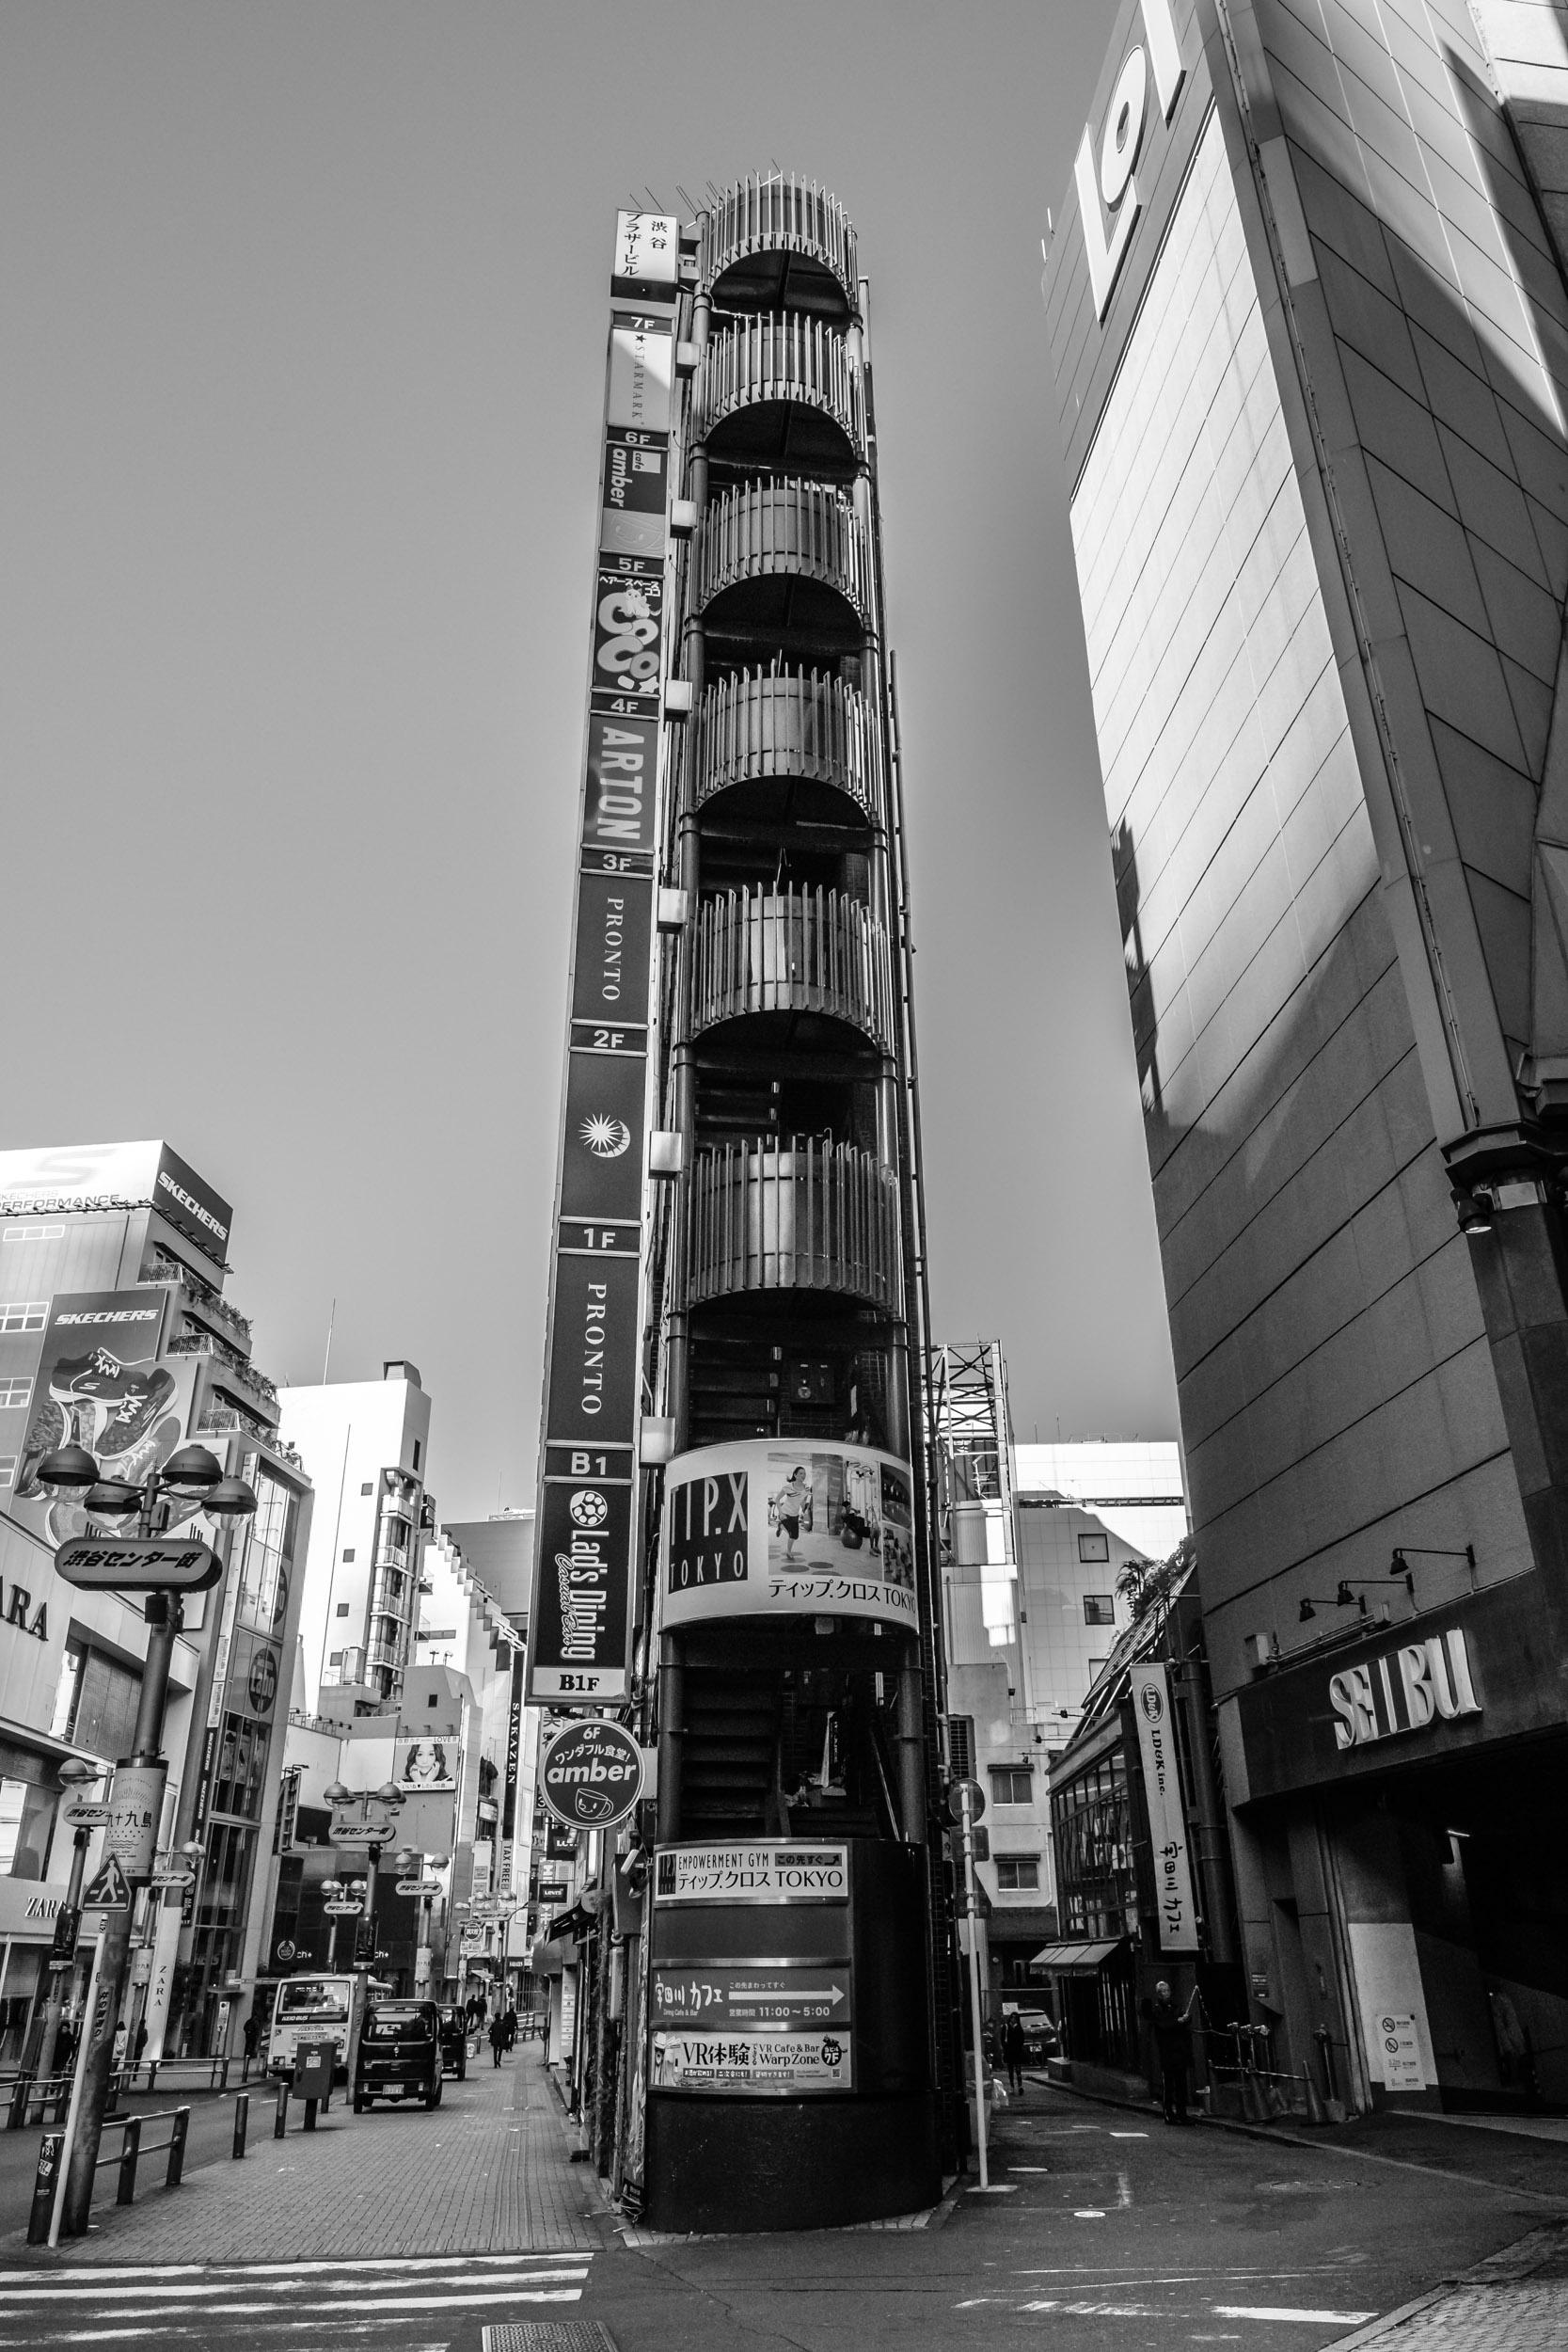 Shibuya also has some very skinny buildings